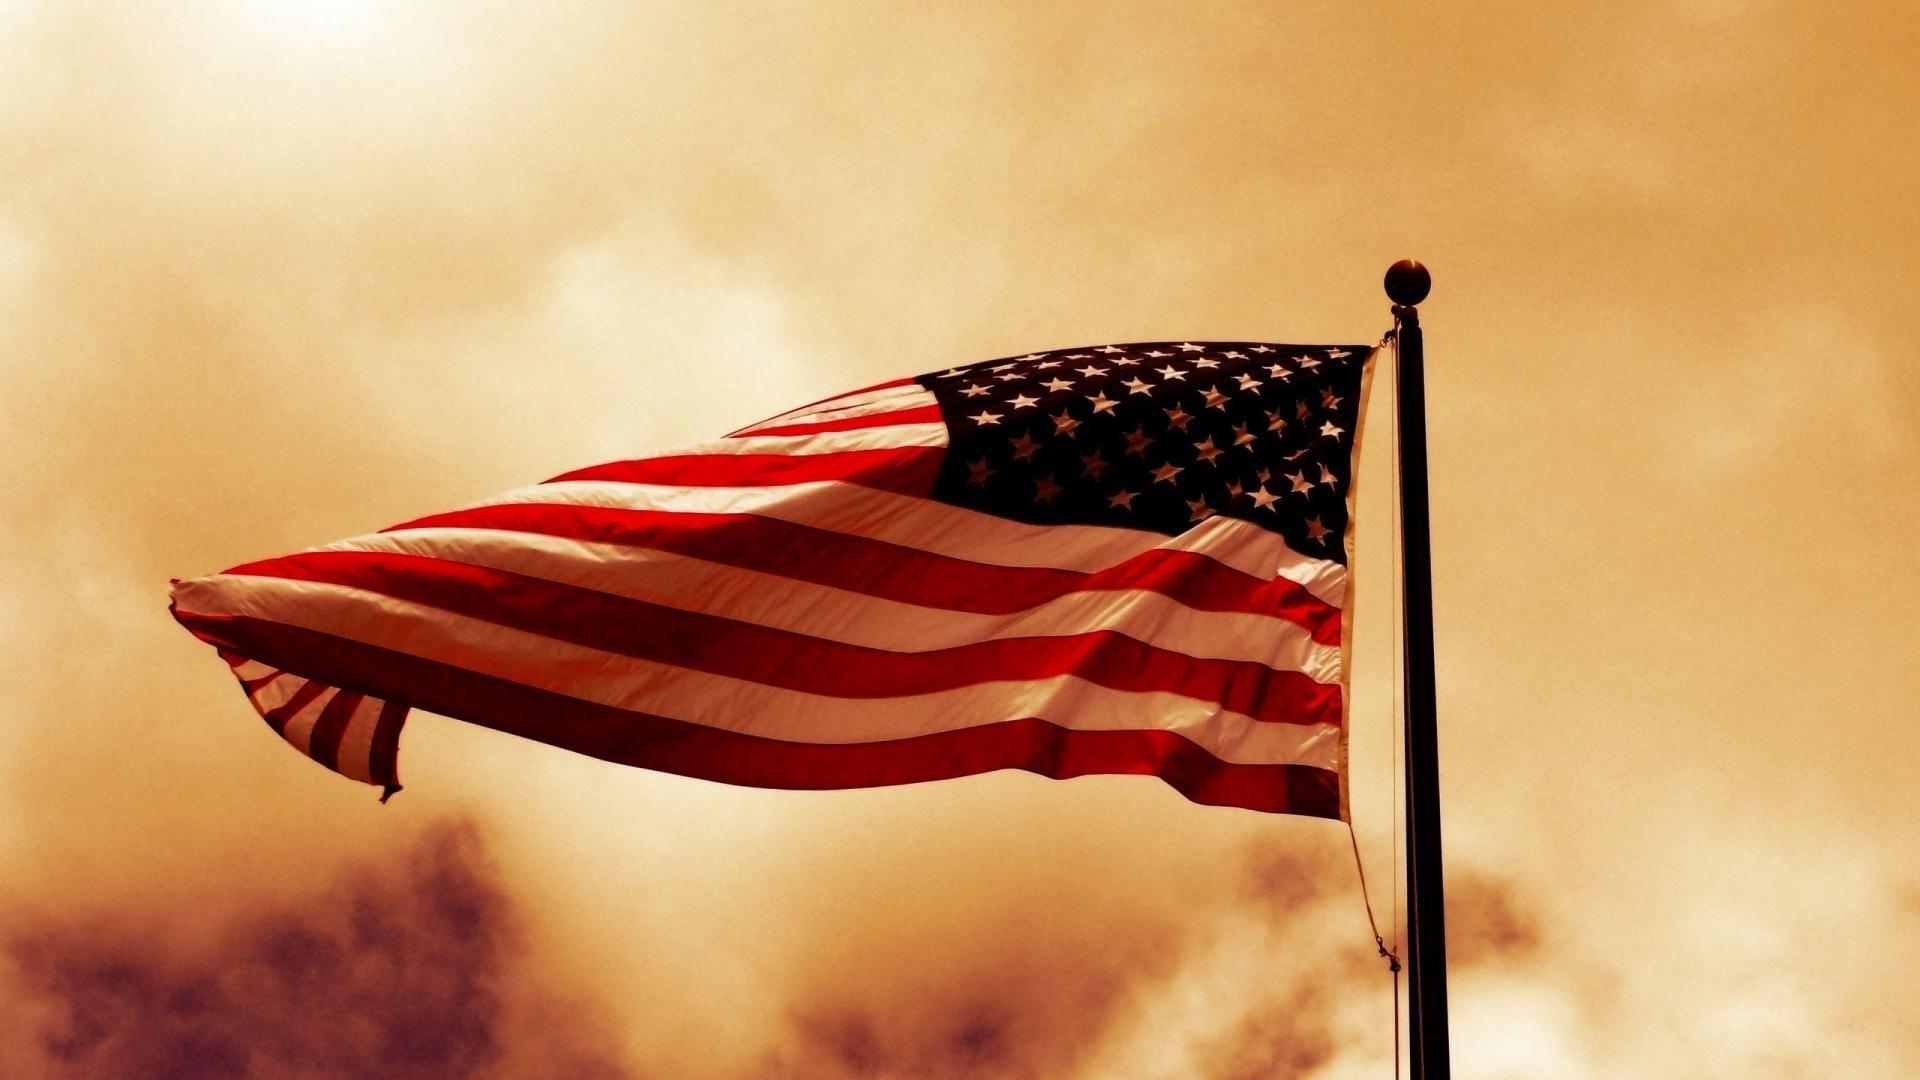 american flag wallpaper hd free download (5) - wallpaper.wiki